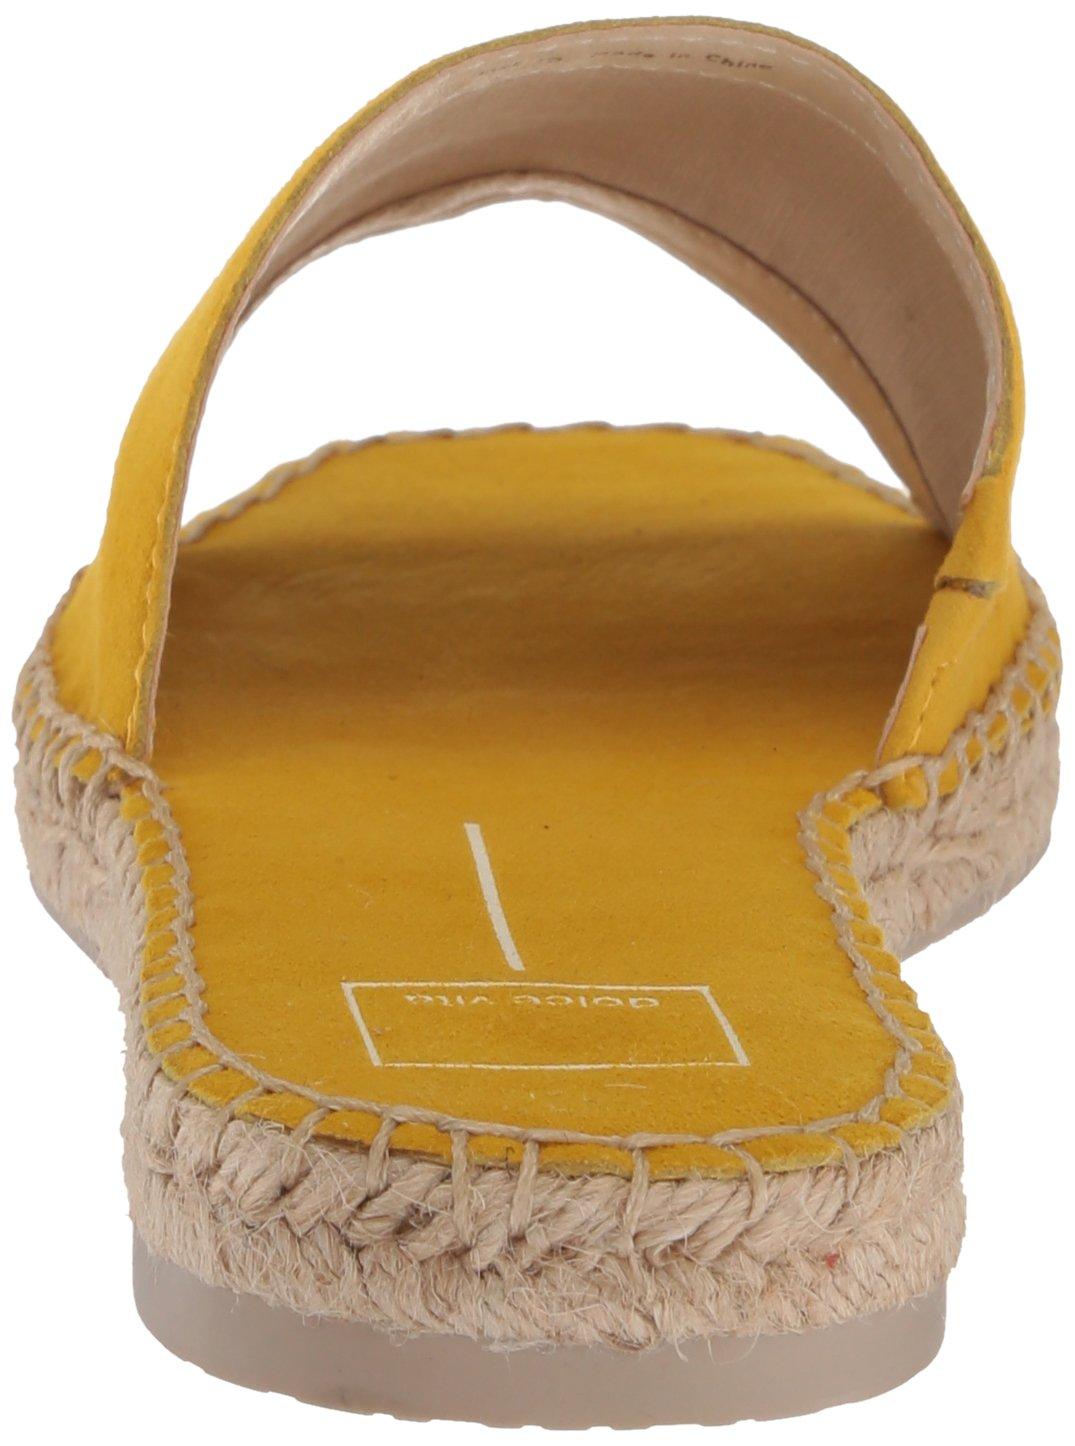 Dolce Vita Women's Bobbi Slide Sandal B077QSH72N 8 B(M) US|Yellow Suede